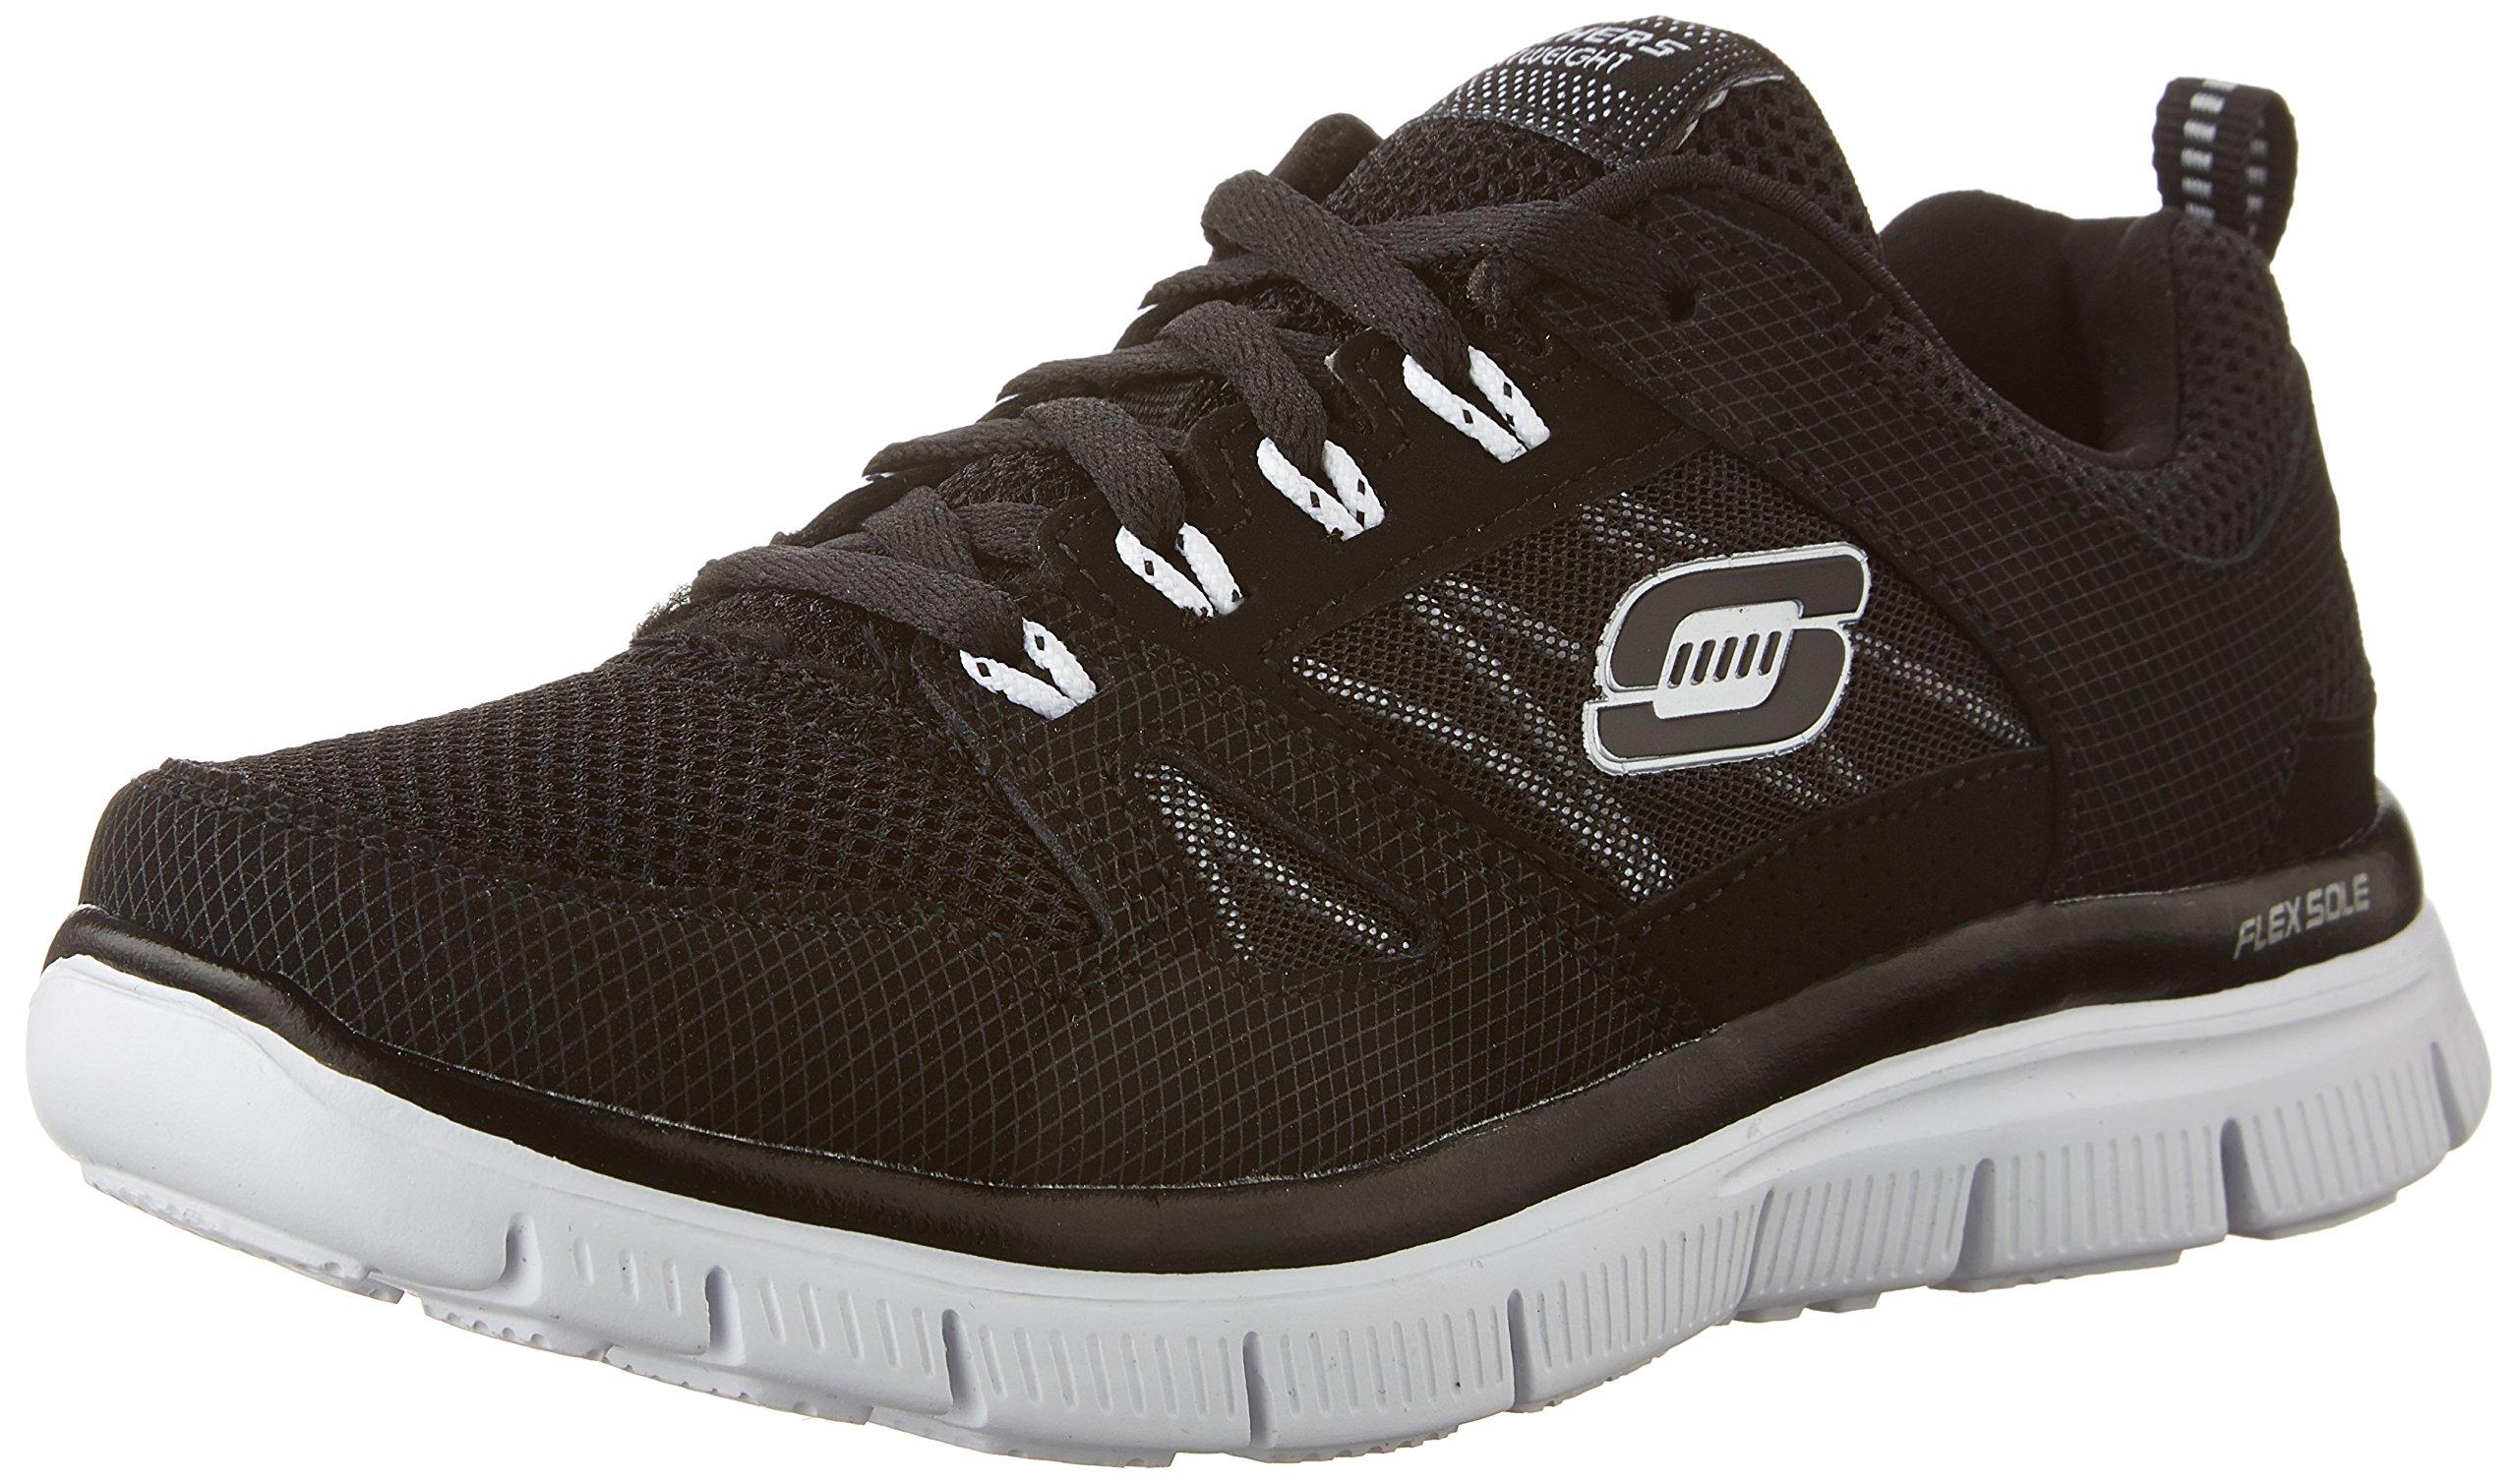 Skechers Kids Flex Advantage Black/White Training Shoe 13 Kids US